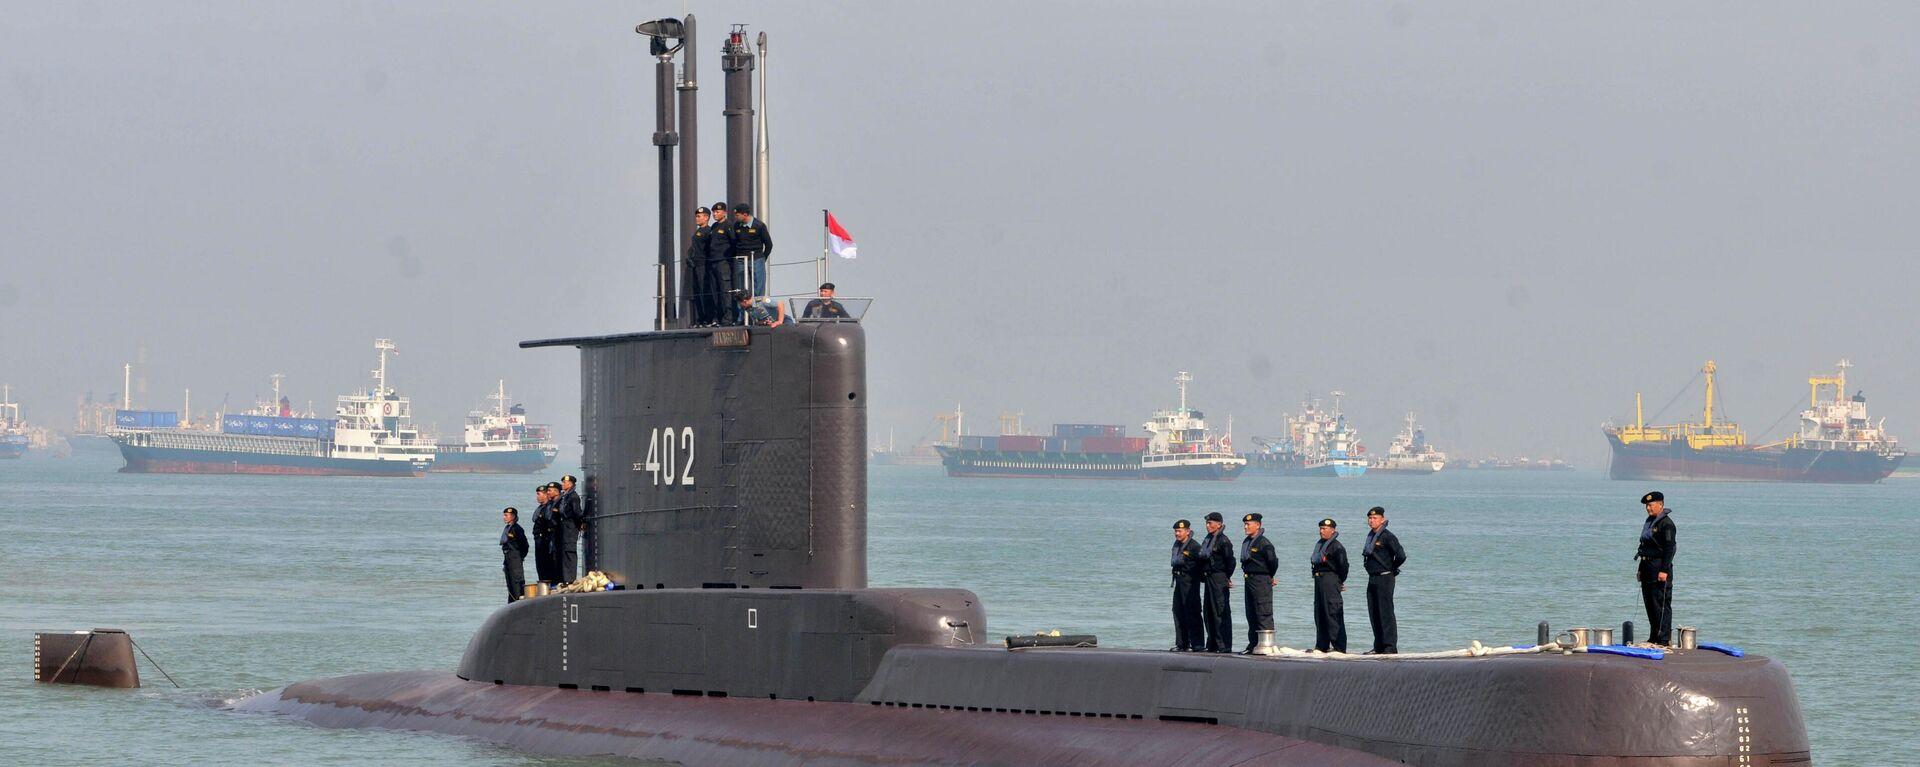 Das indonesische U-Boot Nanggala (Archivbild) - SNA, 1920, 21.04.2021